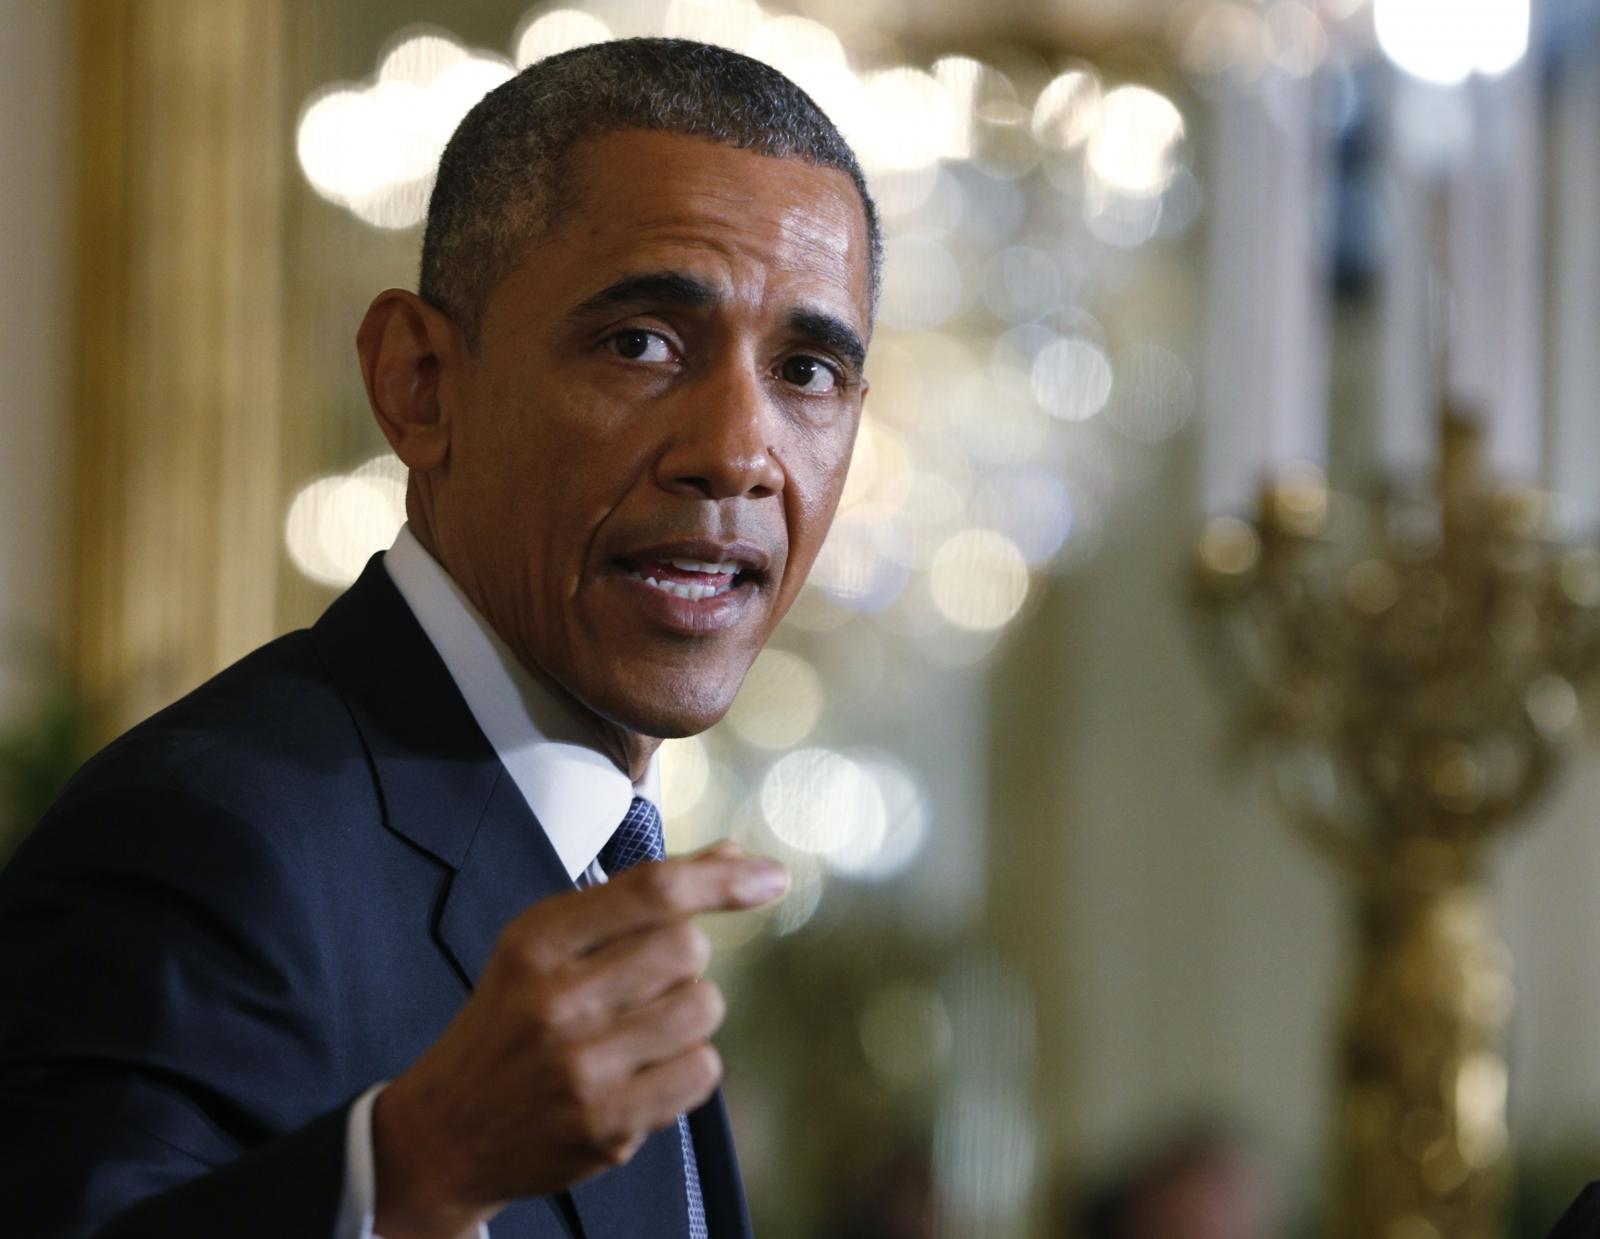 Barack Obama's State of the Union address